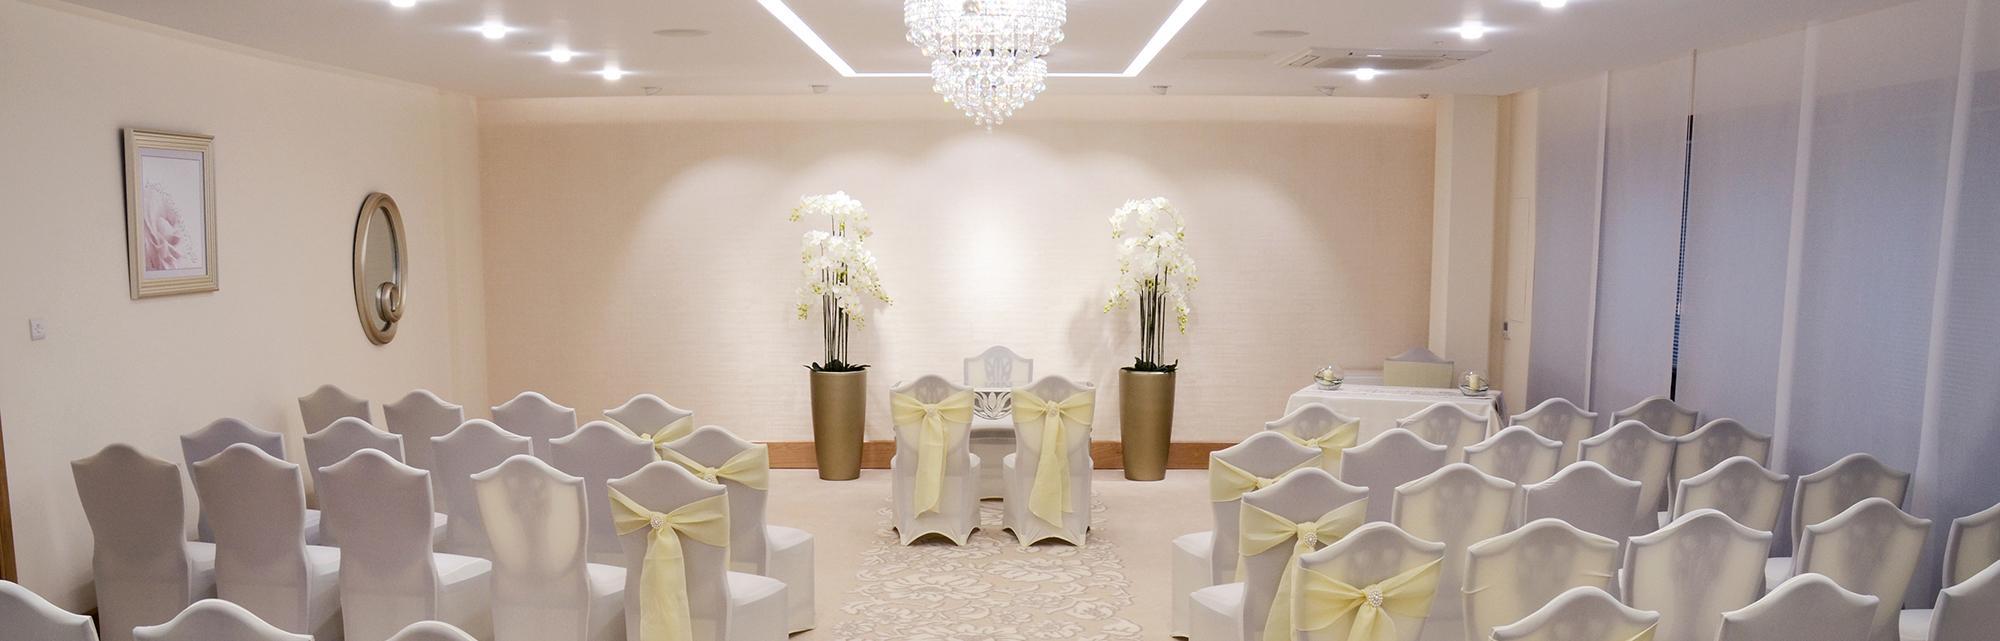 Ravensworth Suite wedding venue, Gateshead